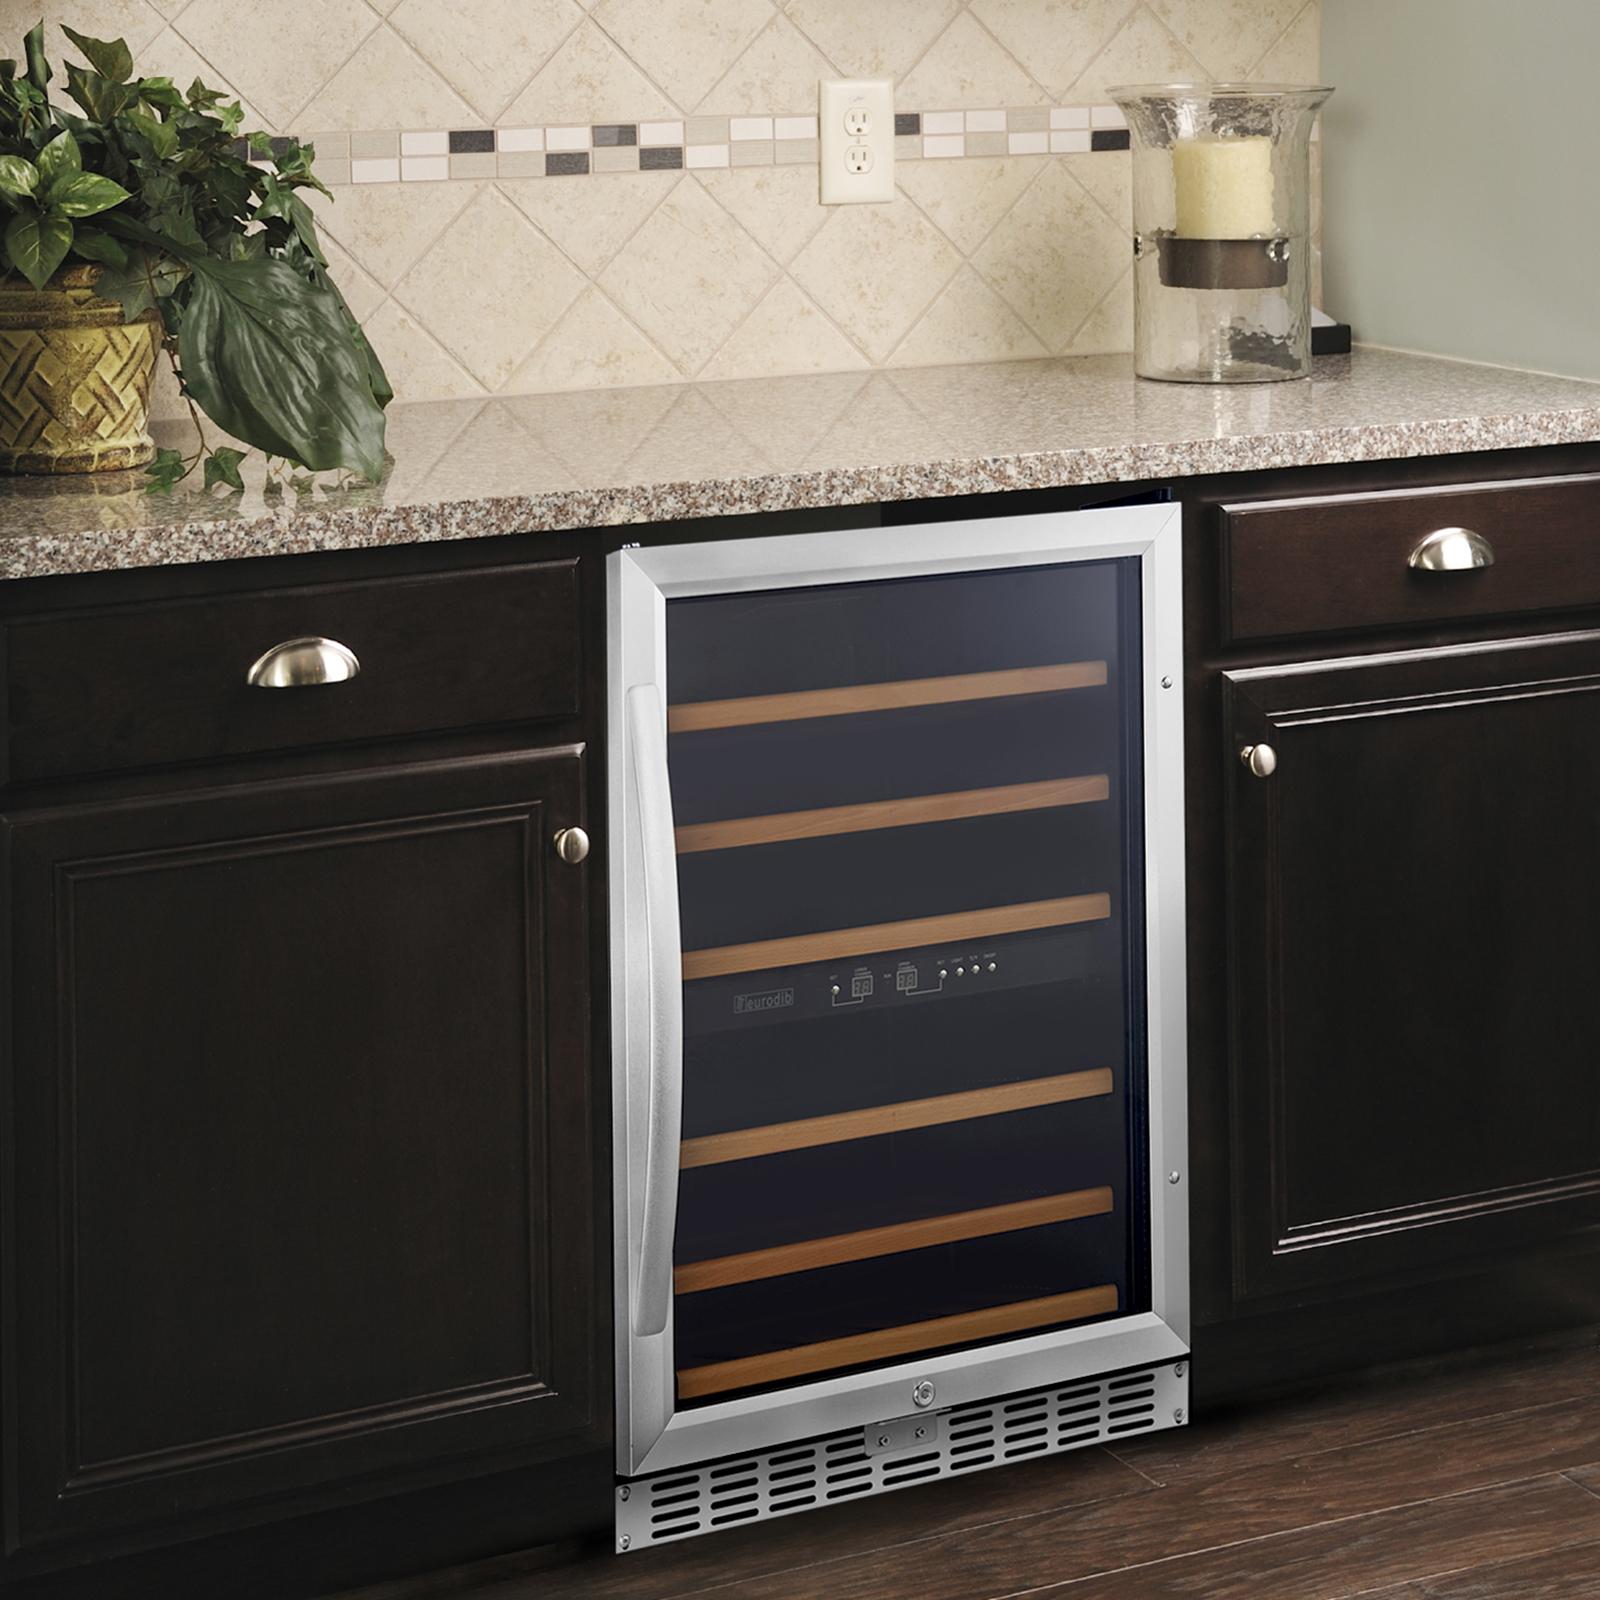 Eurodib USA USF54D wine cellar cabinet